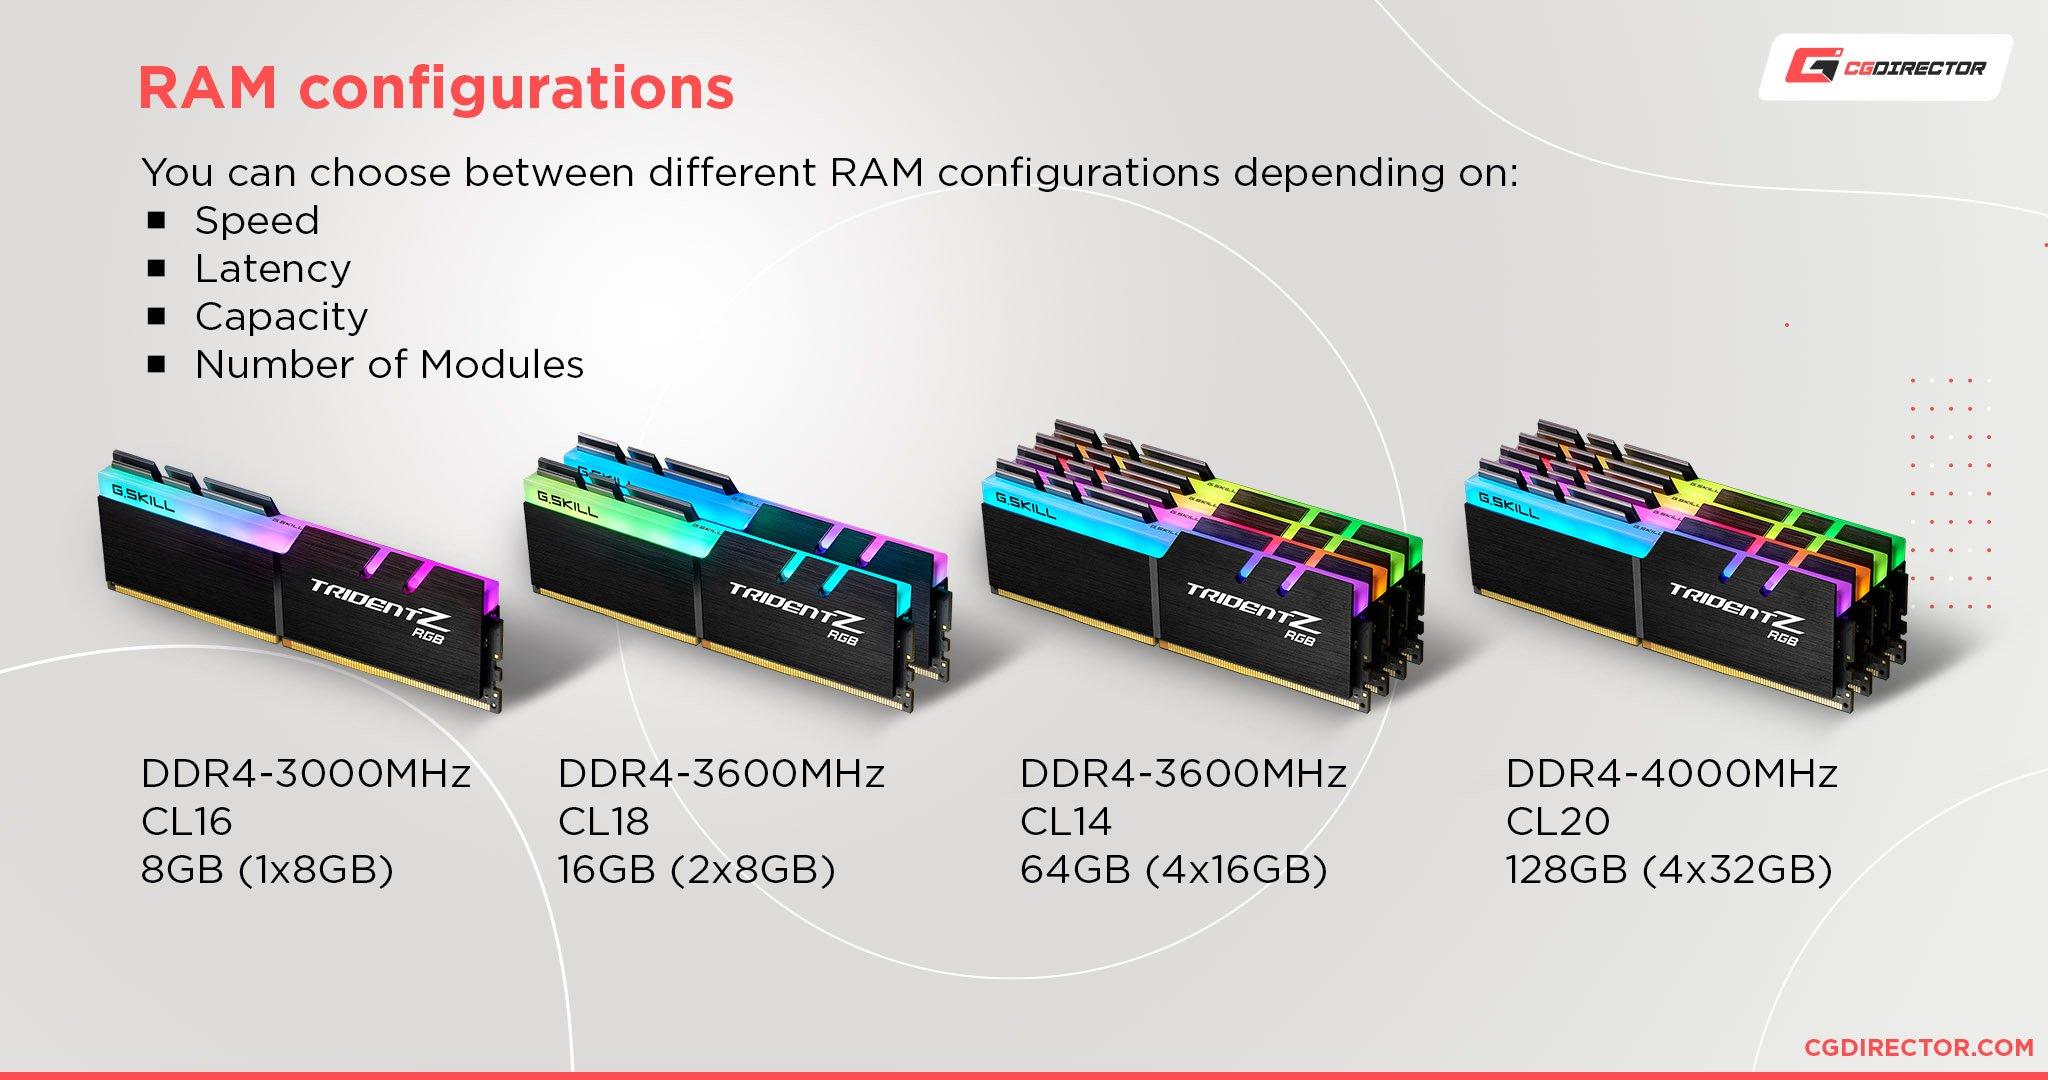 RAM Configurations